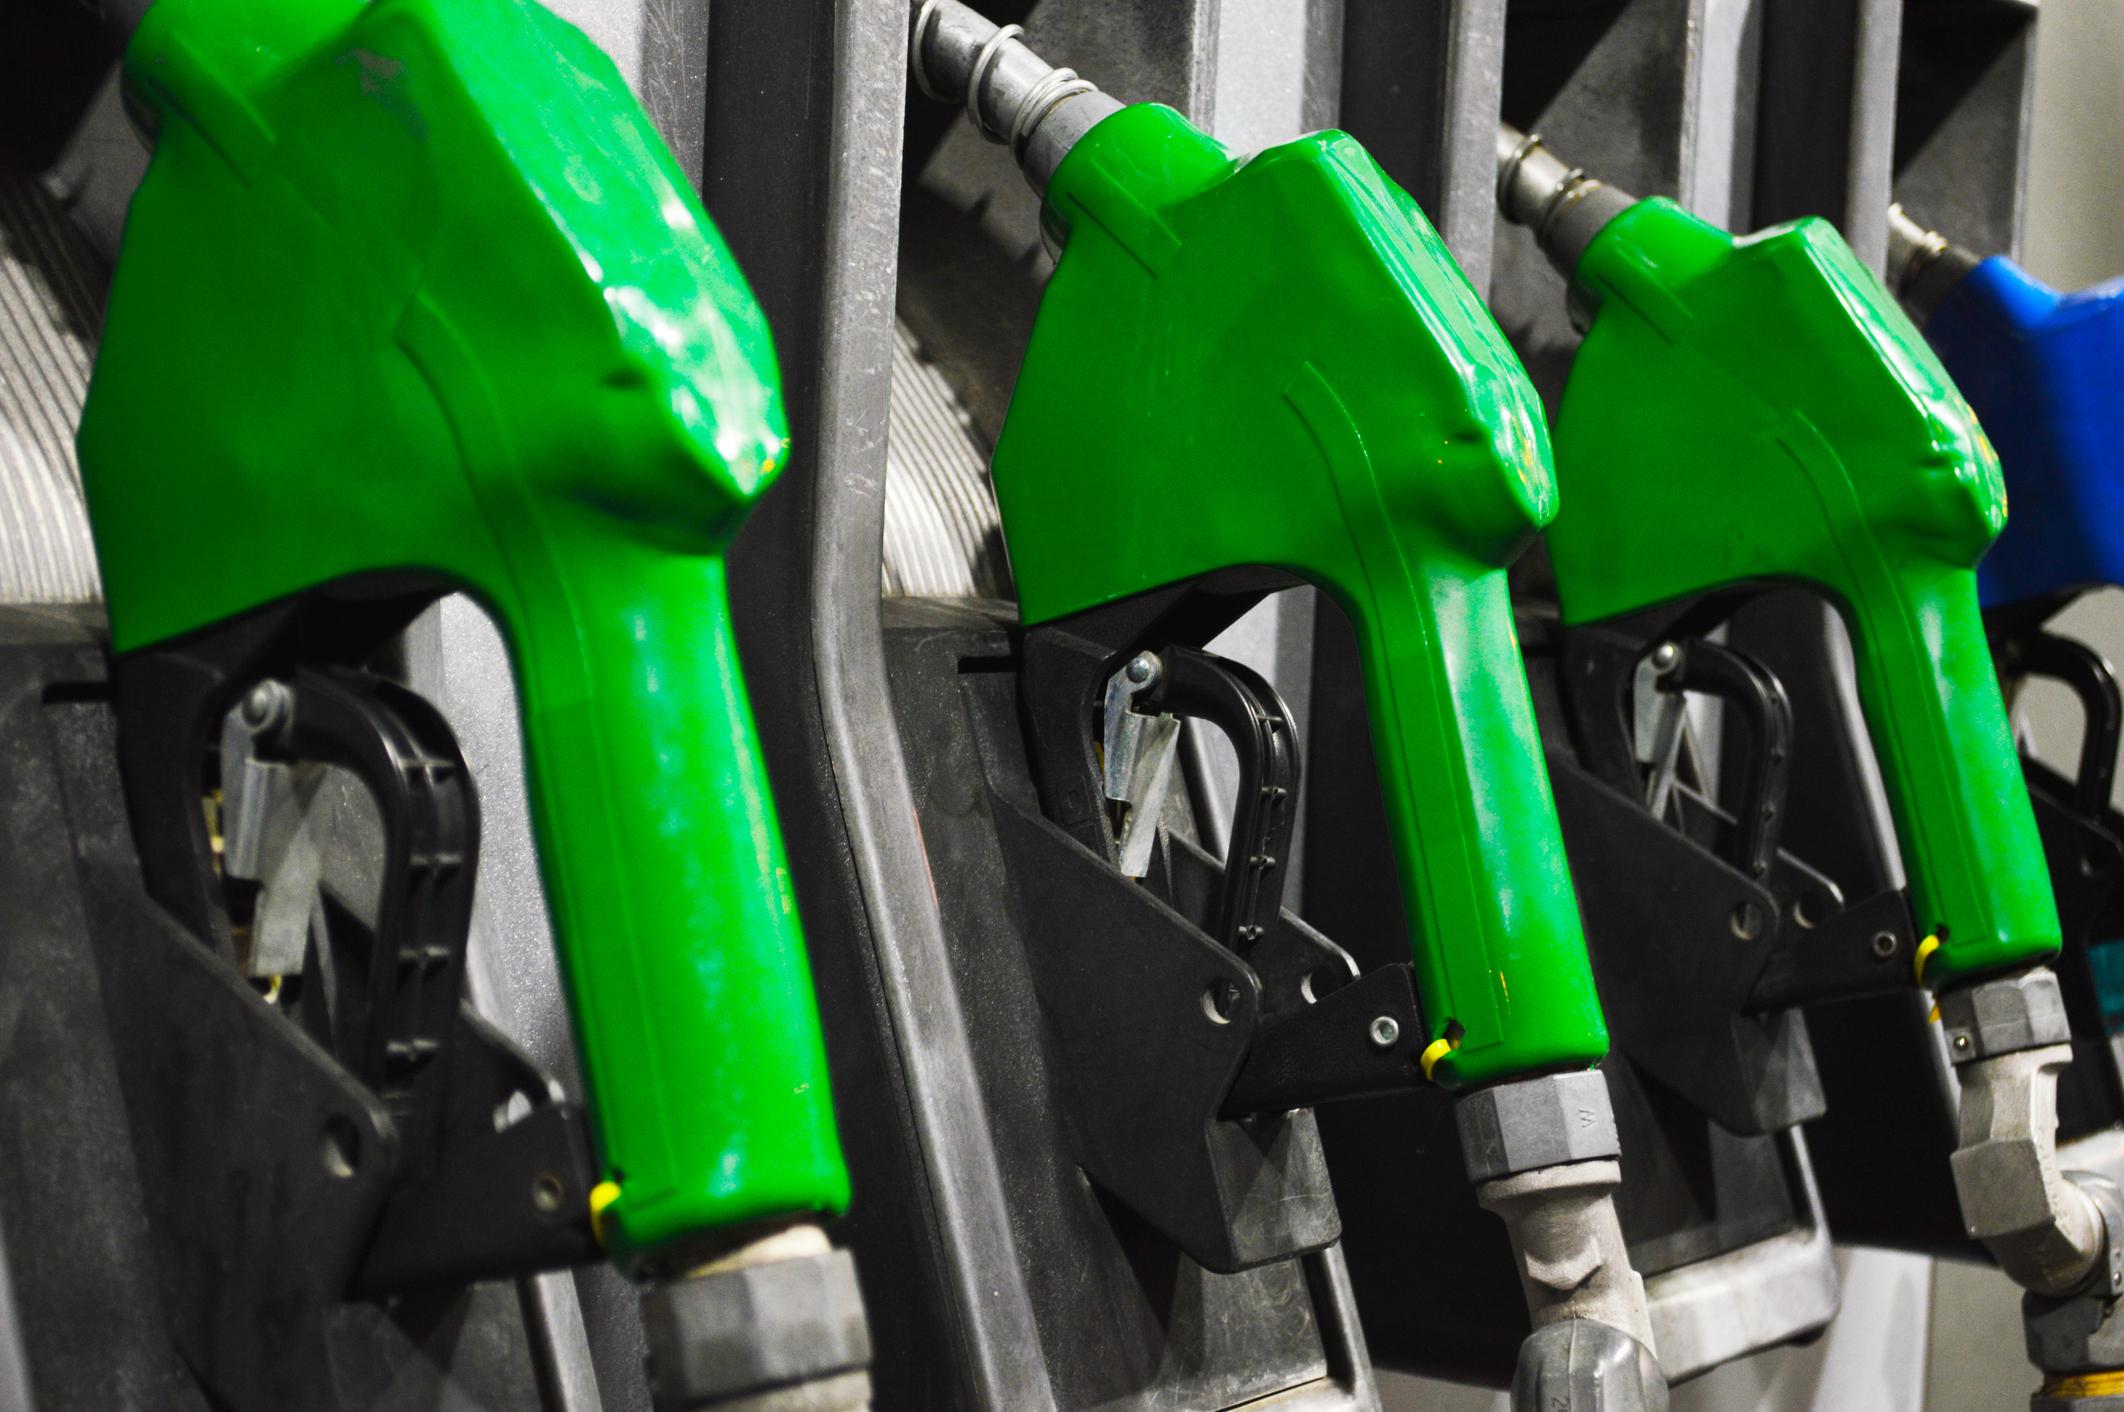 Green and blue fuel nozzles resting in a fuel pump bay